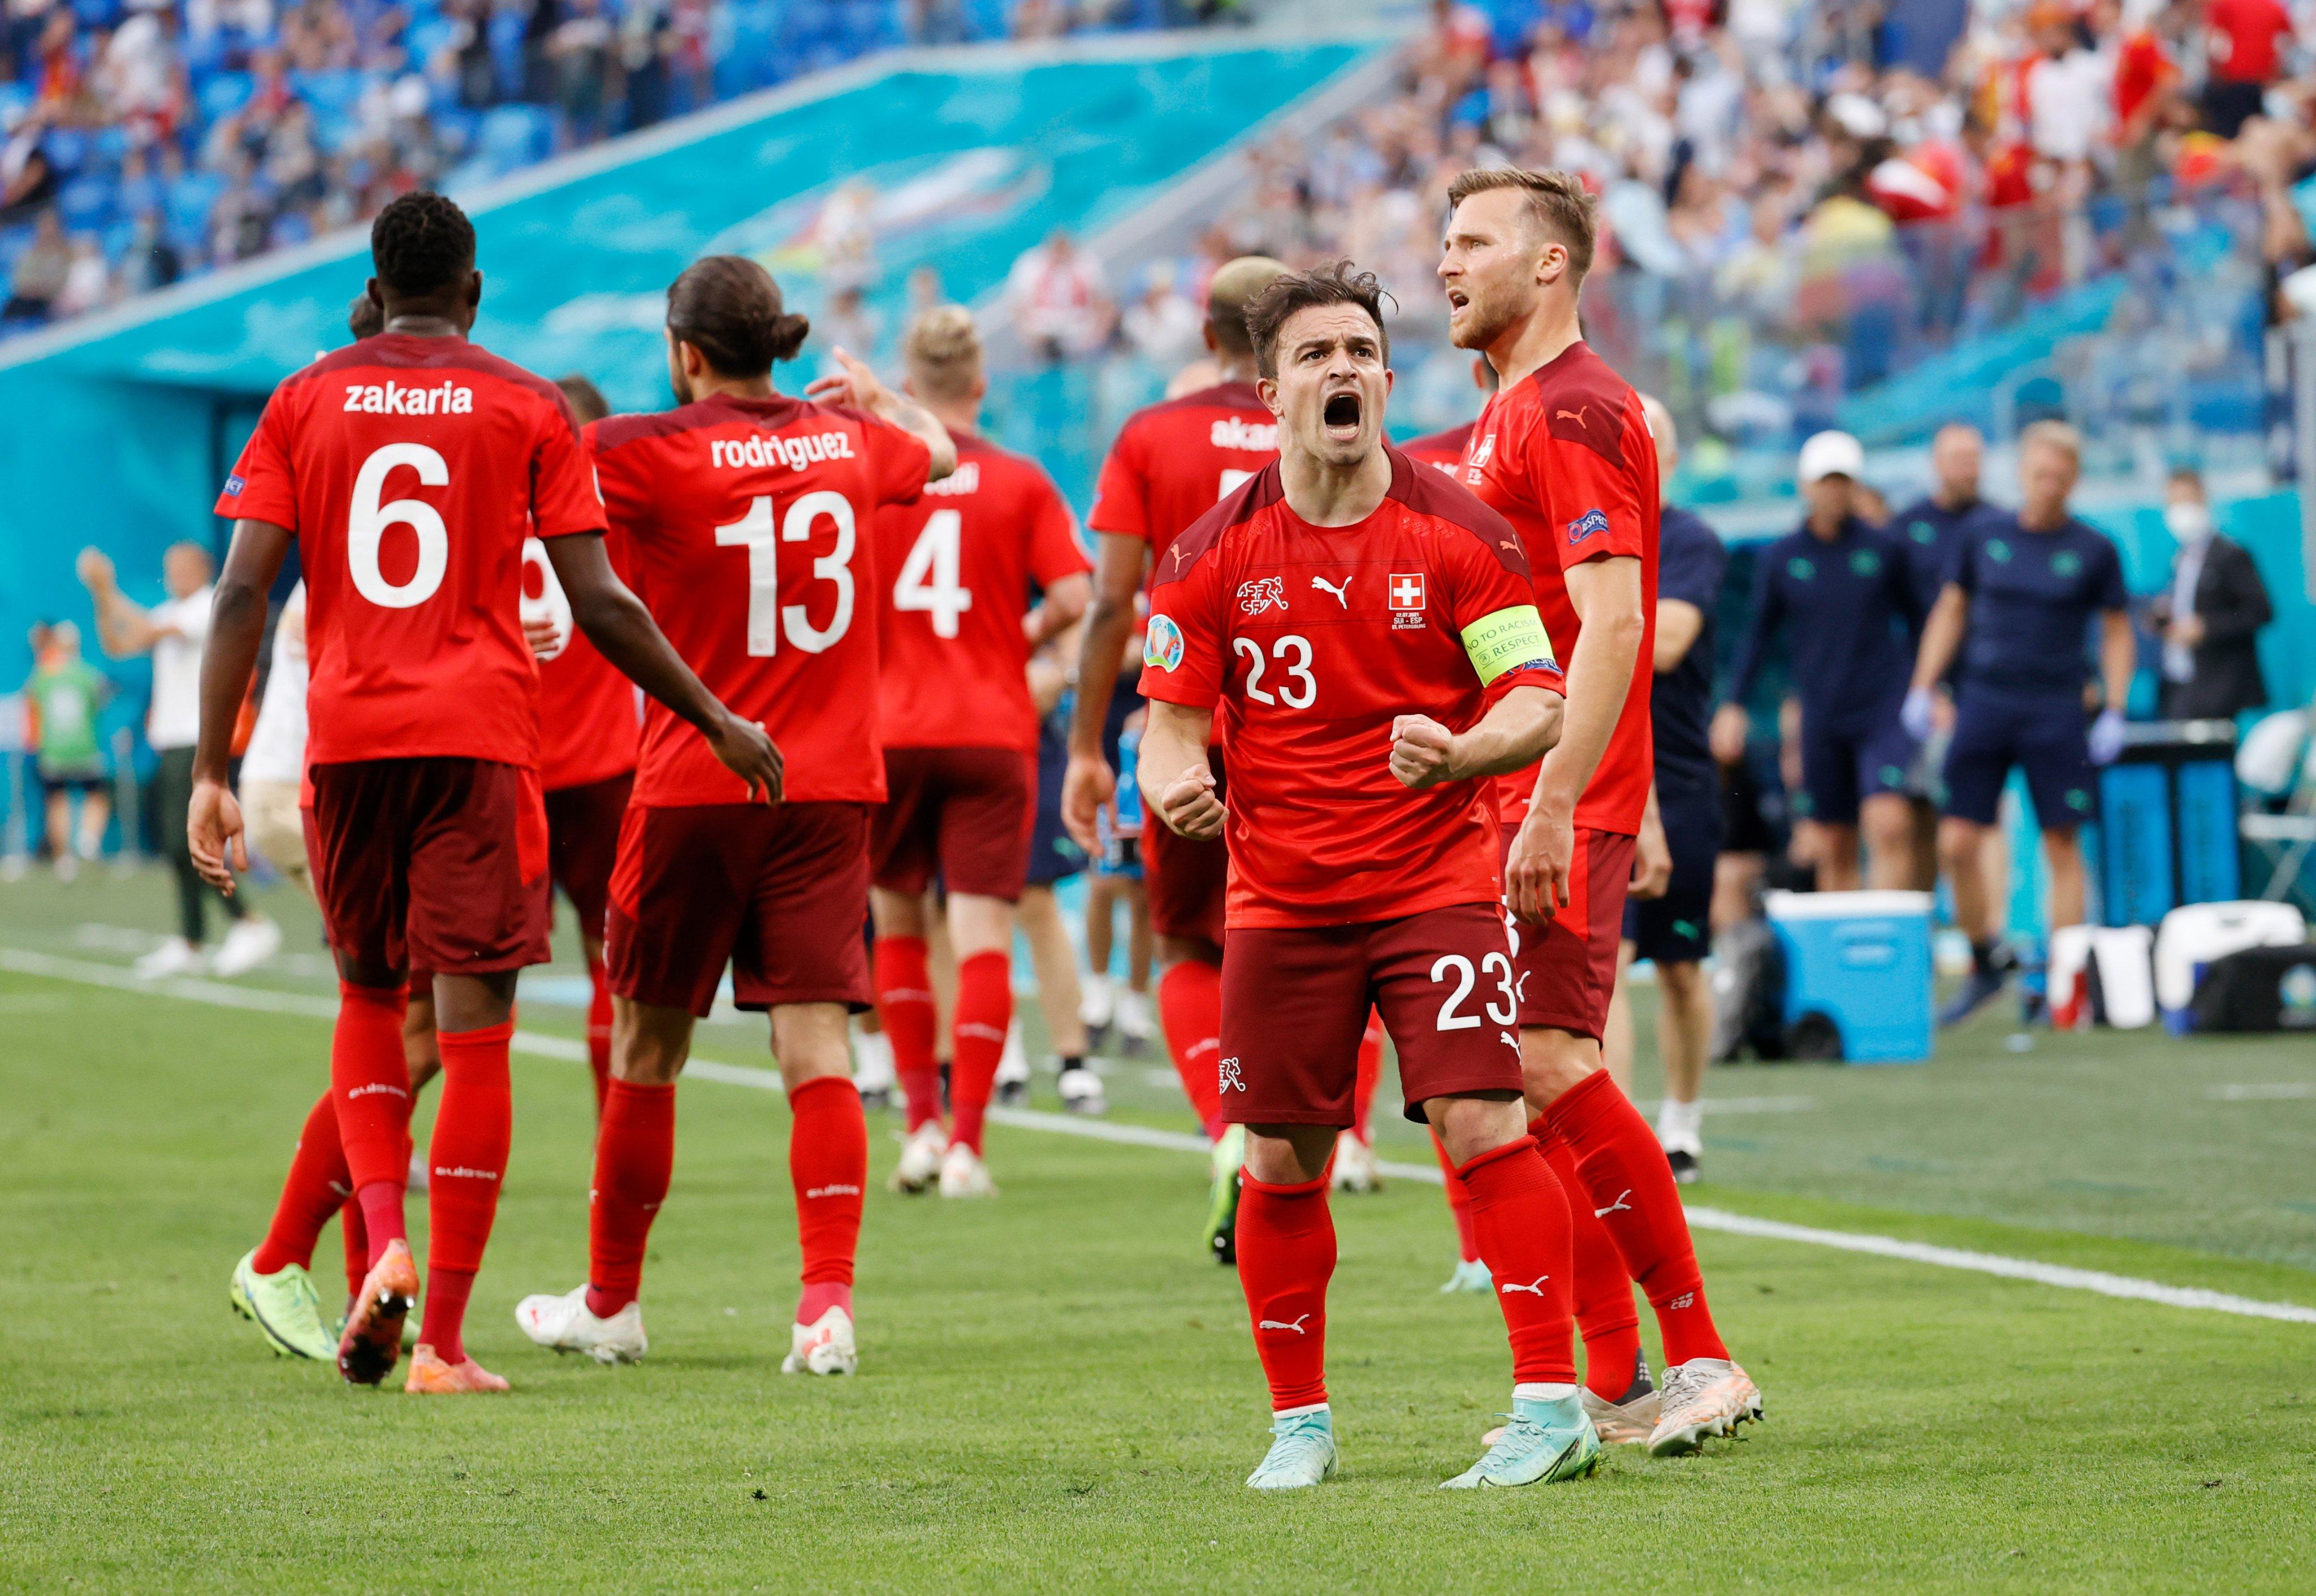 Spain enters Euro 2020 semifinals, beat Swiss on penalties 3(1)-1(1)